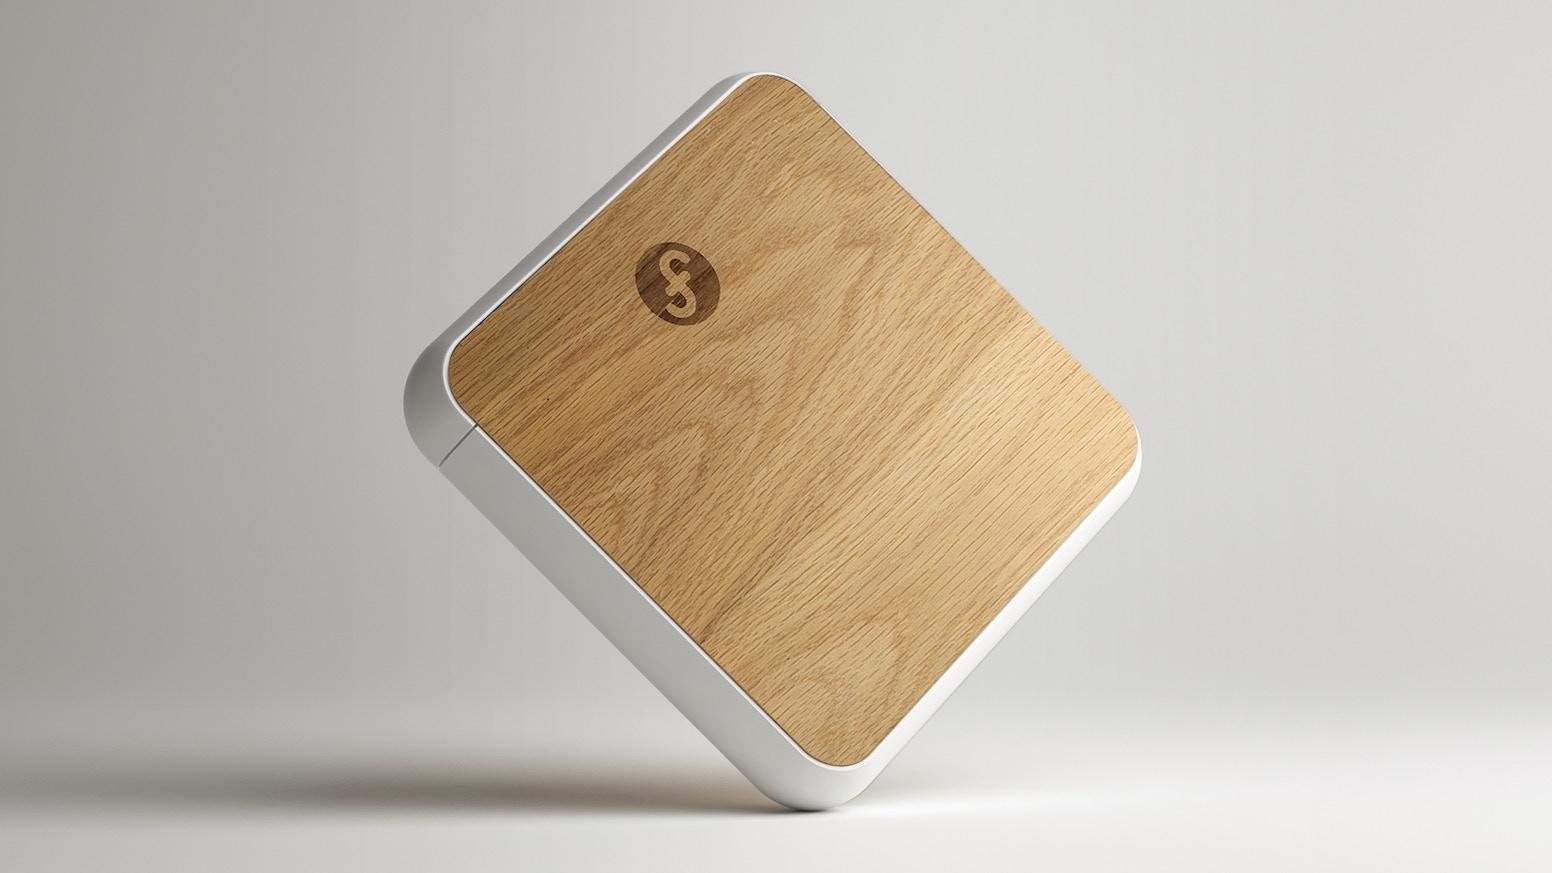 Lunch Box Design Games